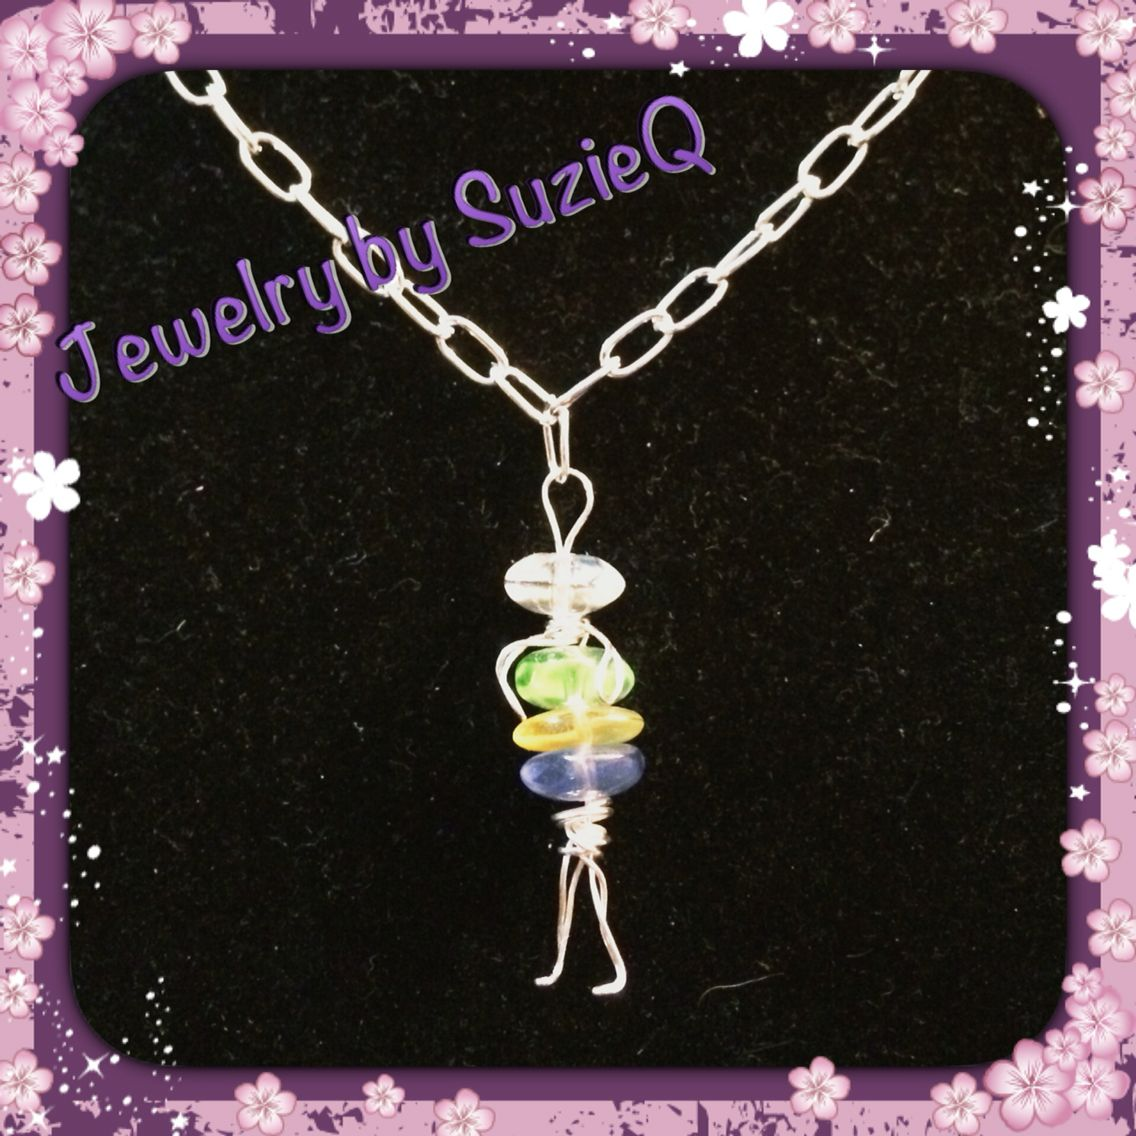 People charm necklace #charm #jewelry #jewelrybysusieq #handmade